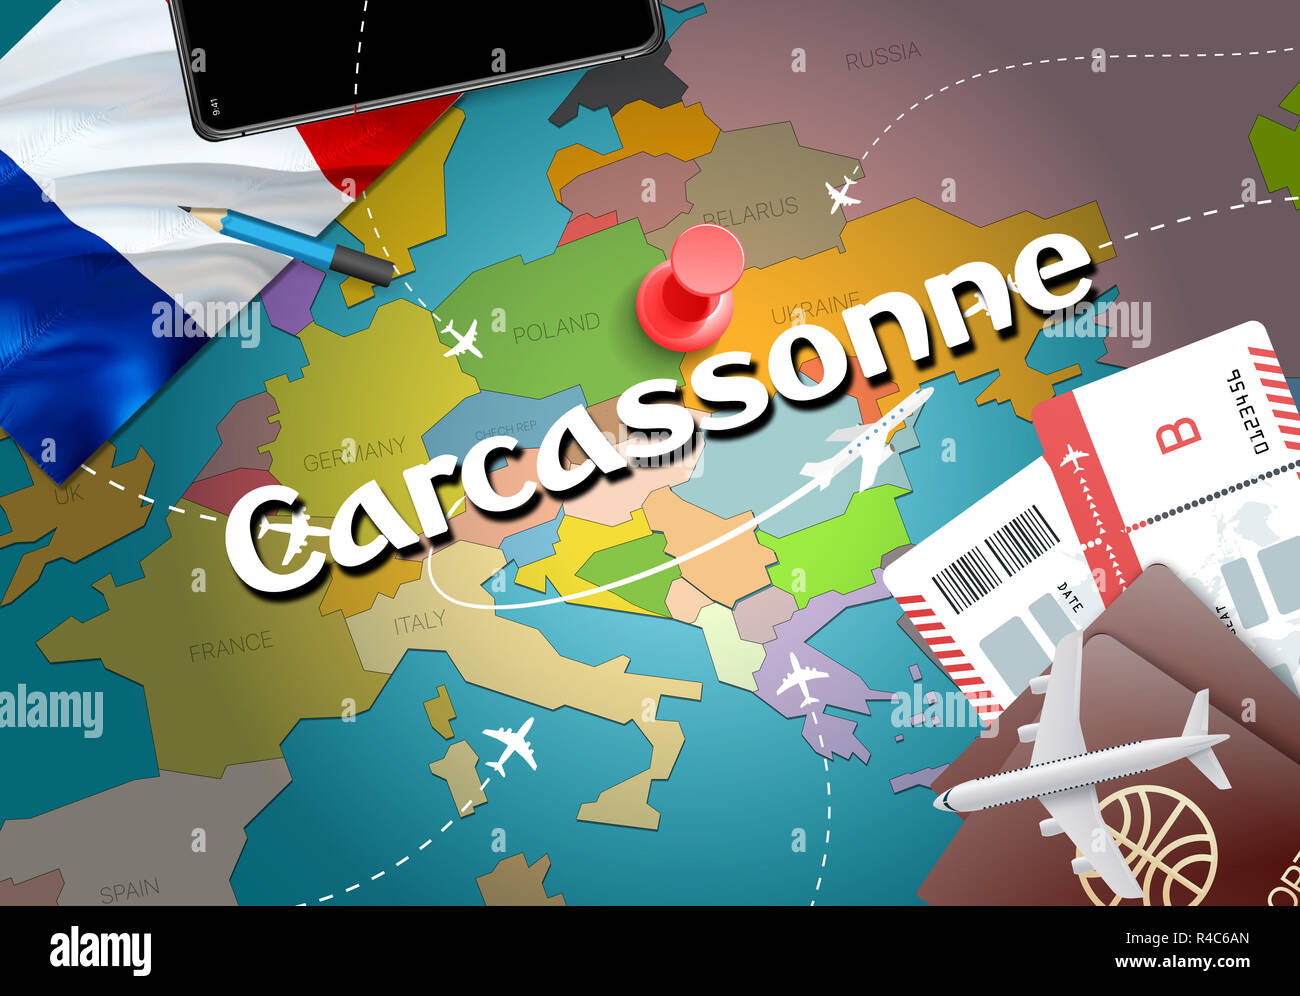 Map Of France Carcassonne.Carcassonne City Travel And Tourism Destination Concept France Flag